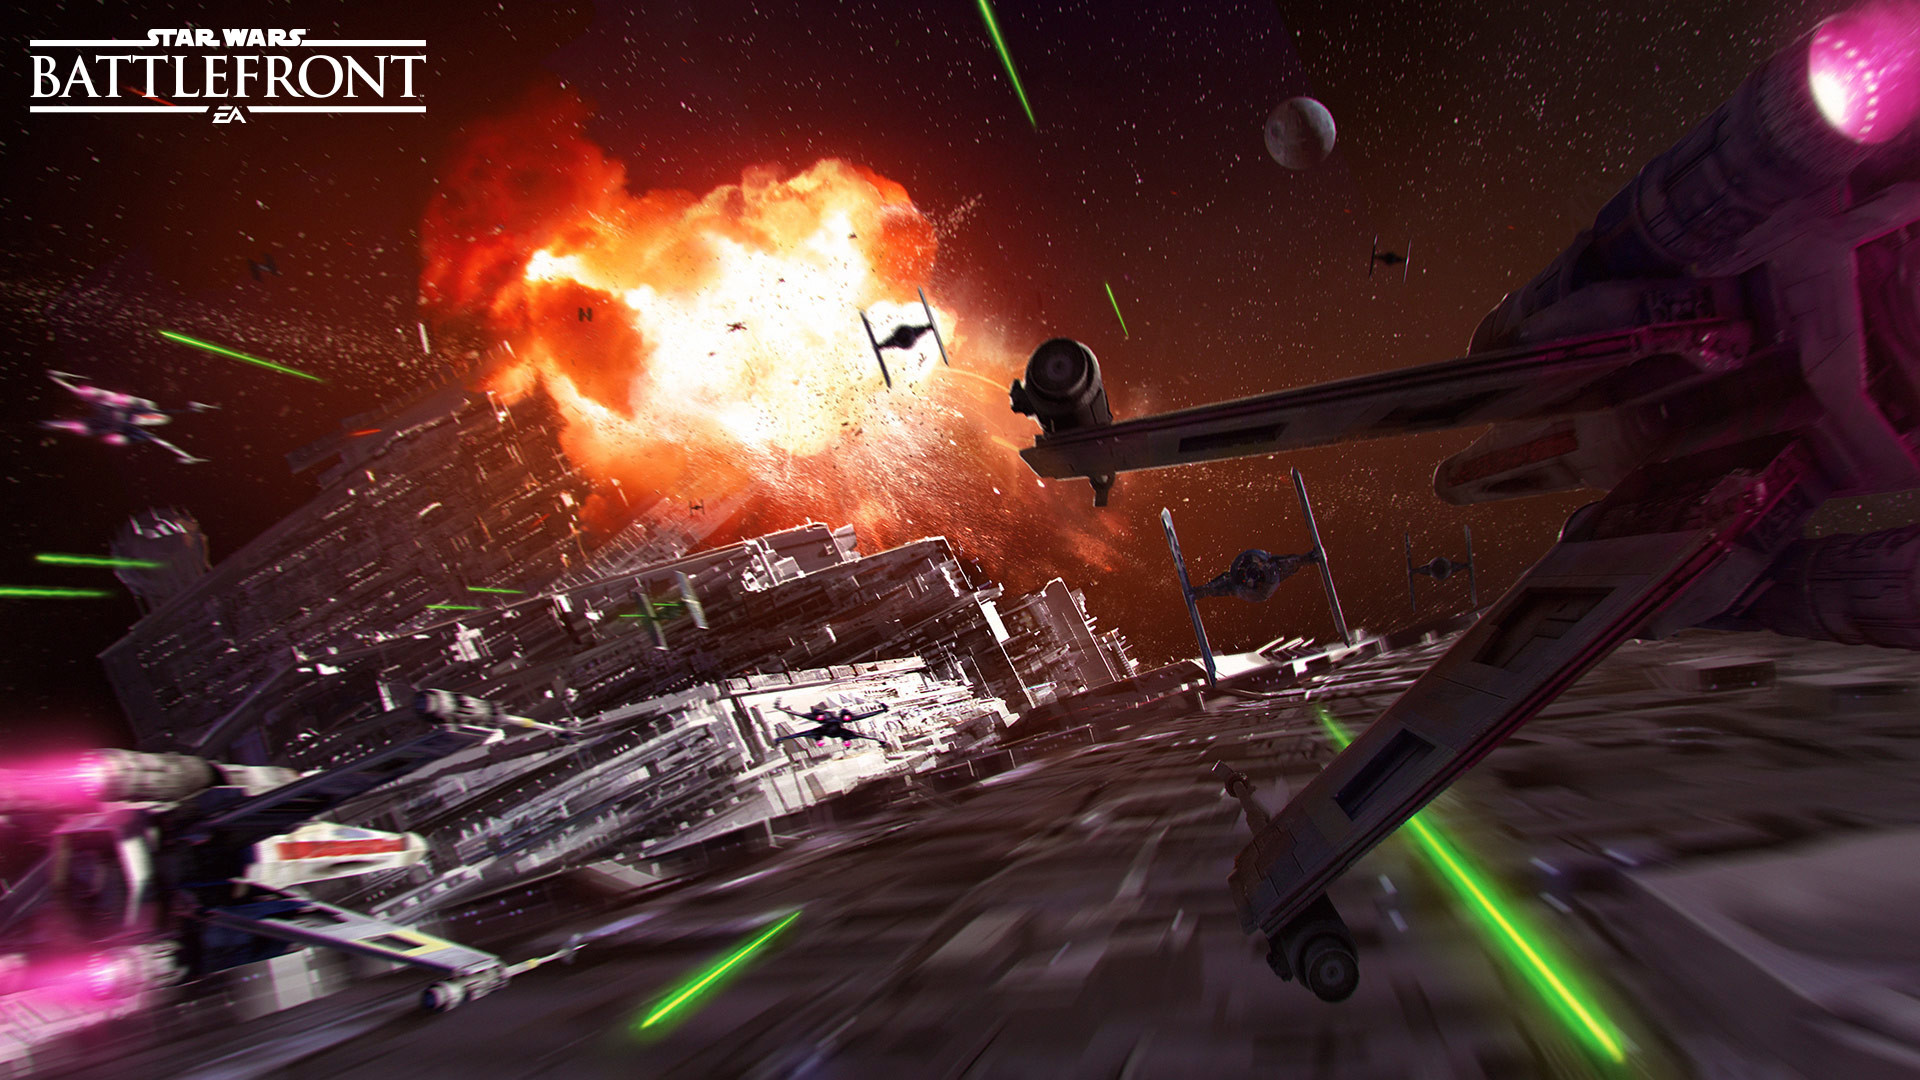 Star Wars Space Battle Wallpaper 61 Images